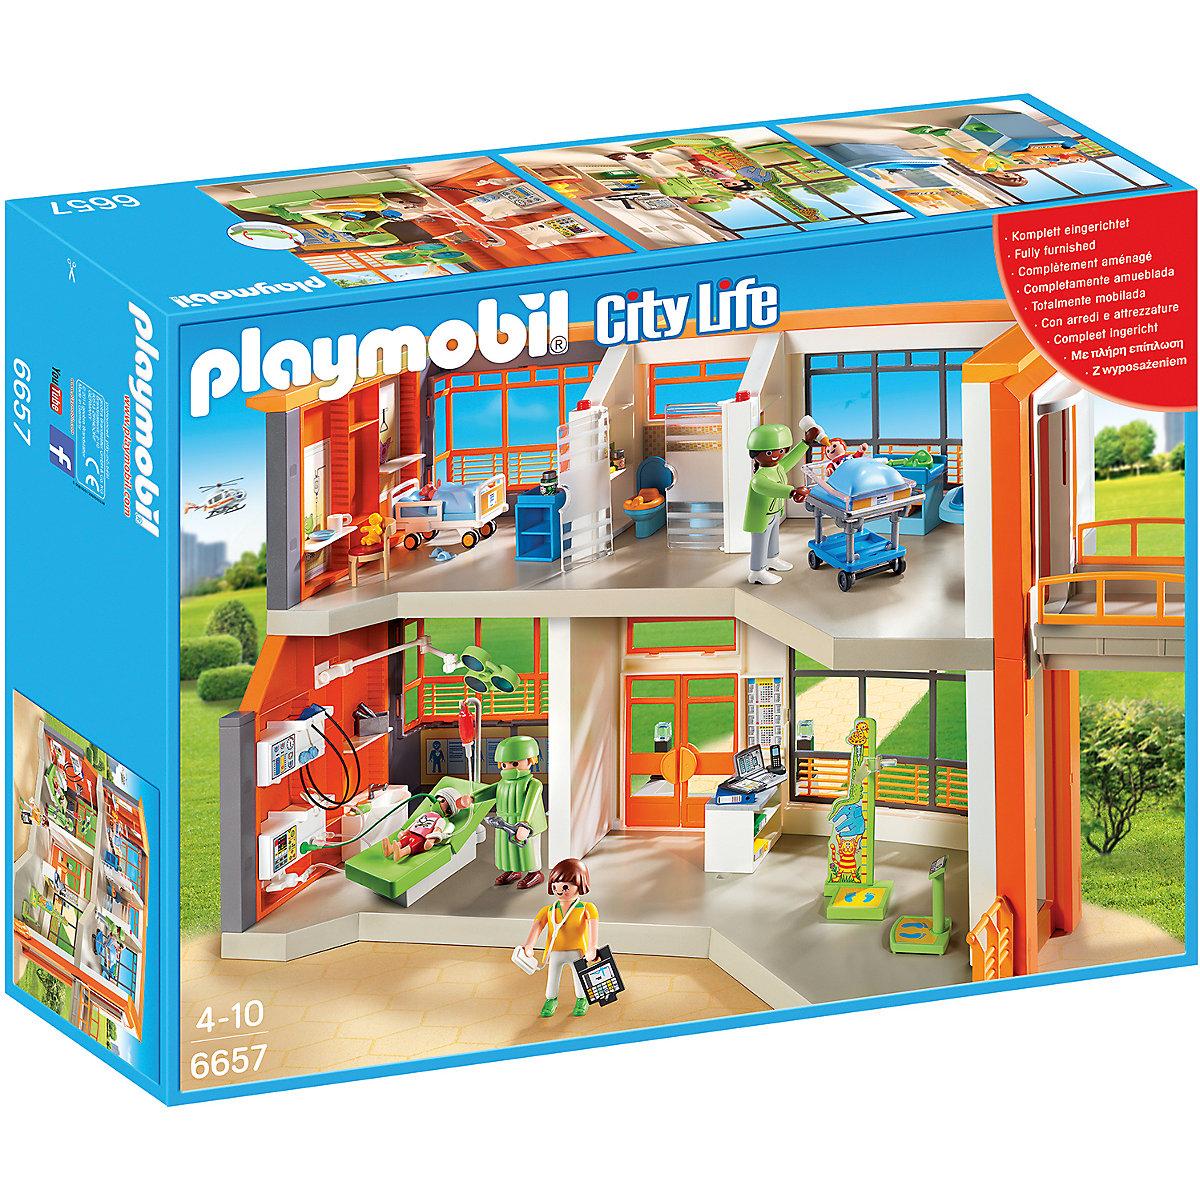 [mytoys] In offerta: Playmobil 6657 - Ospedale Pediatrico Attrezzato per 66,92€